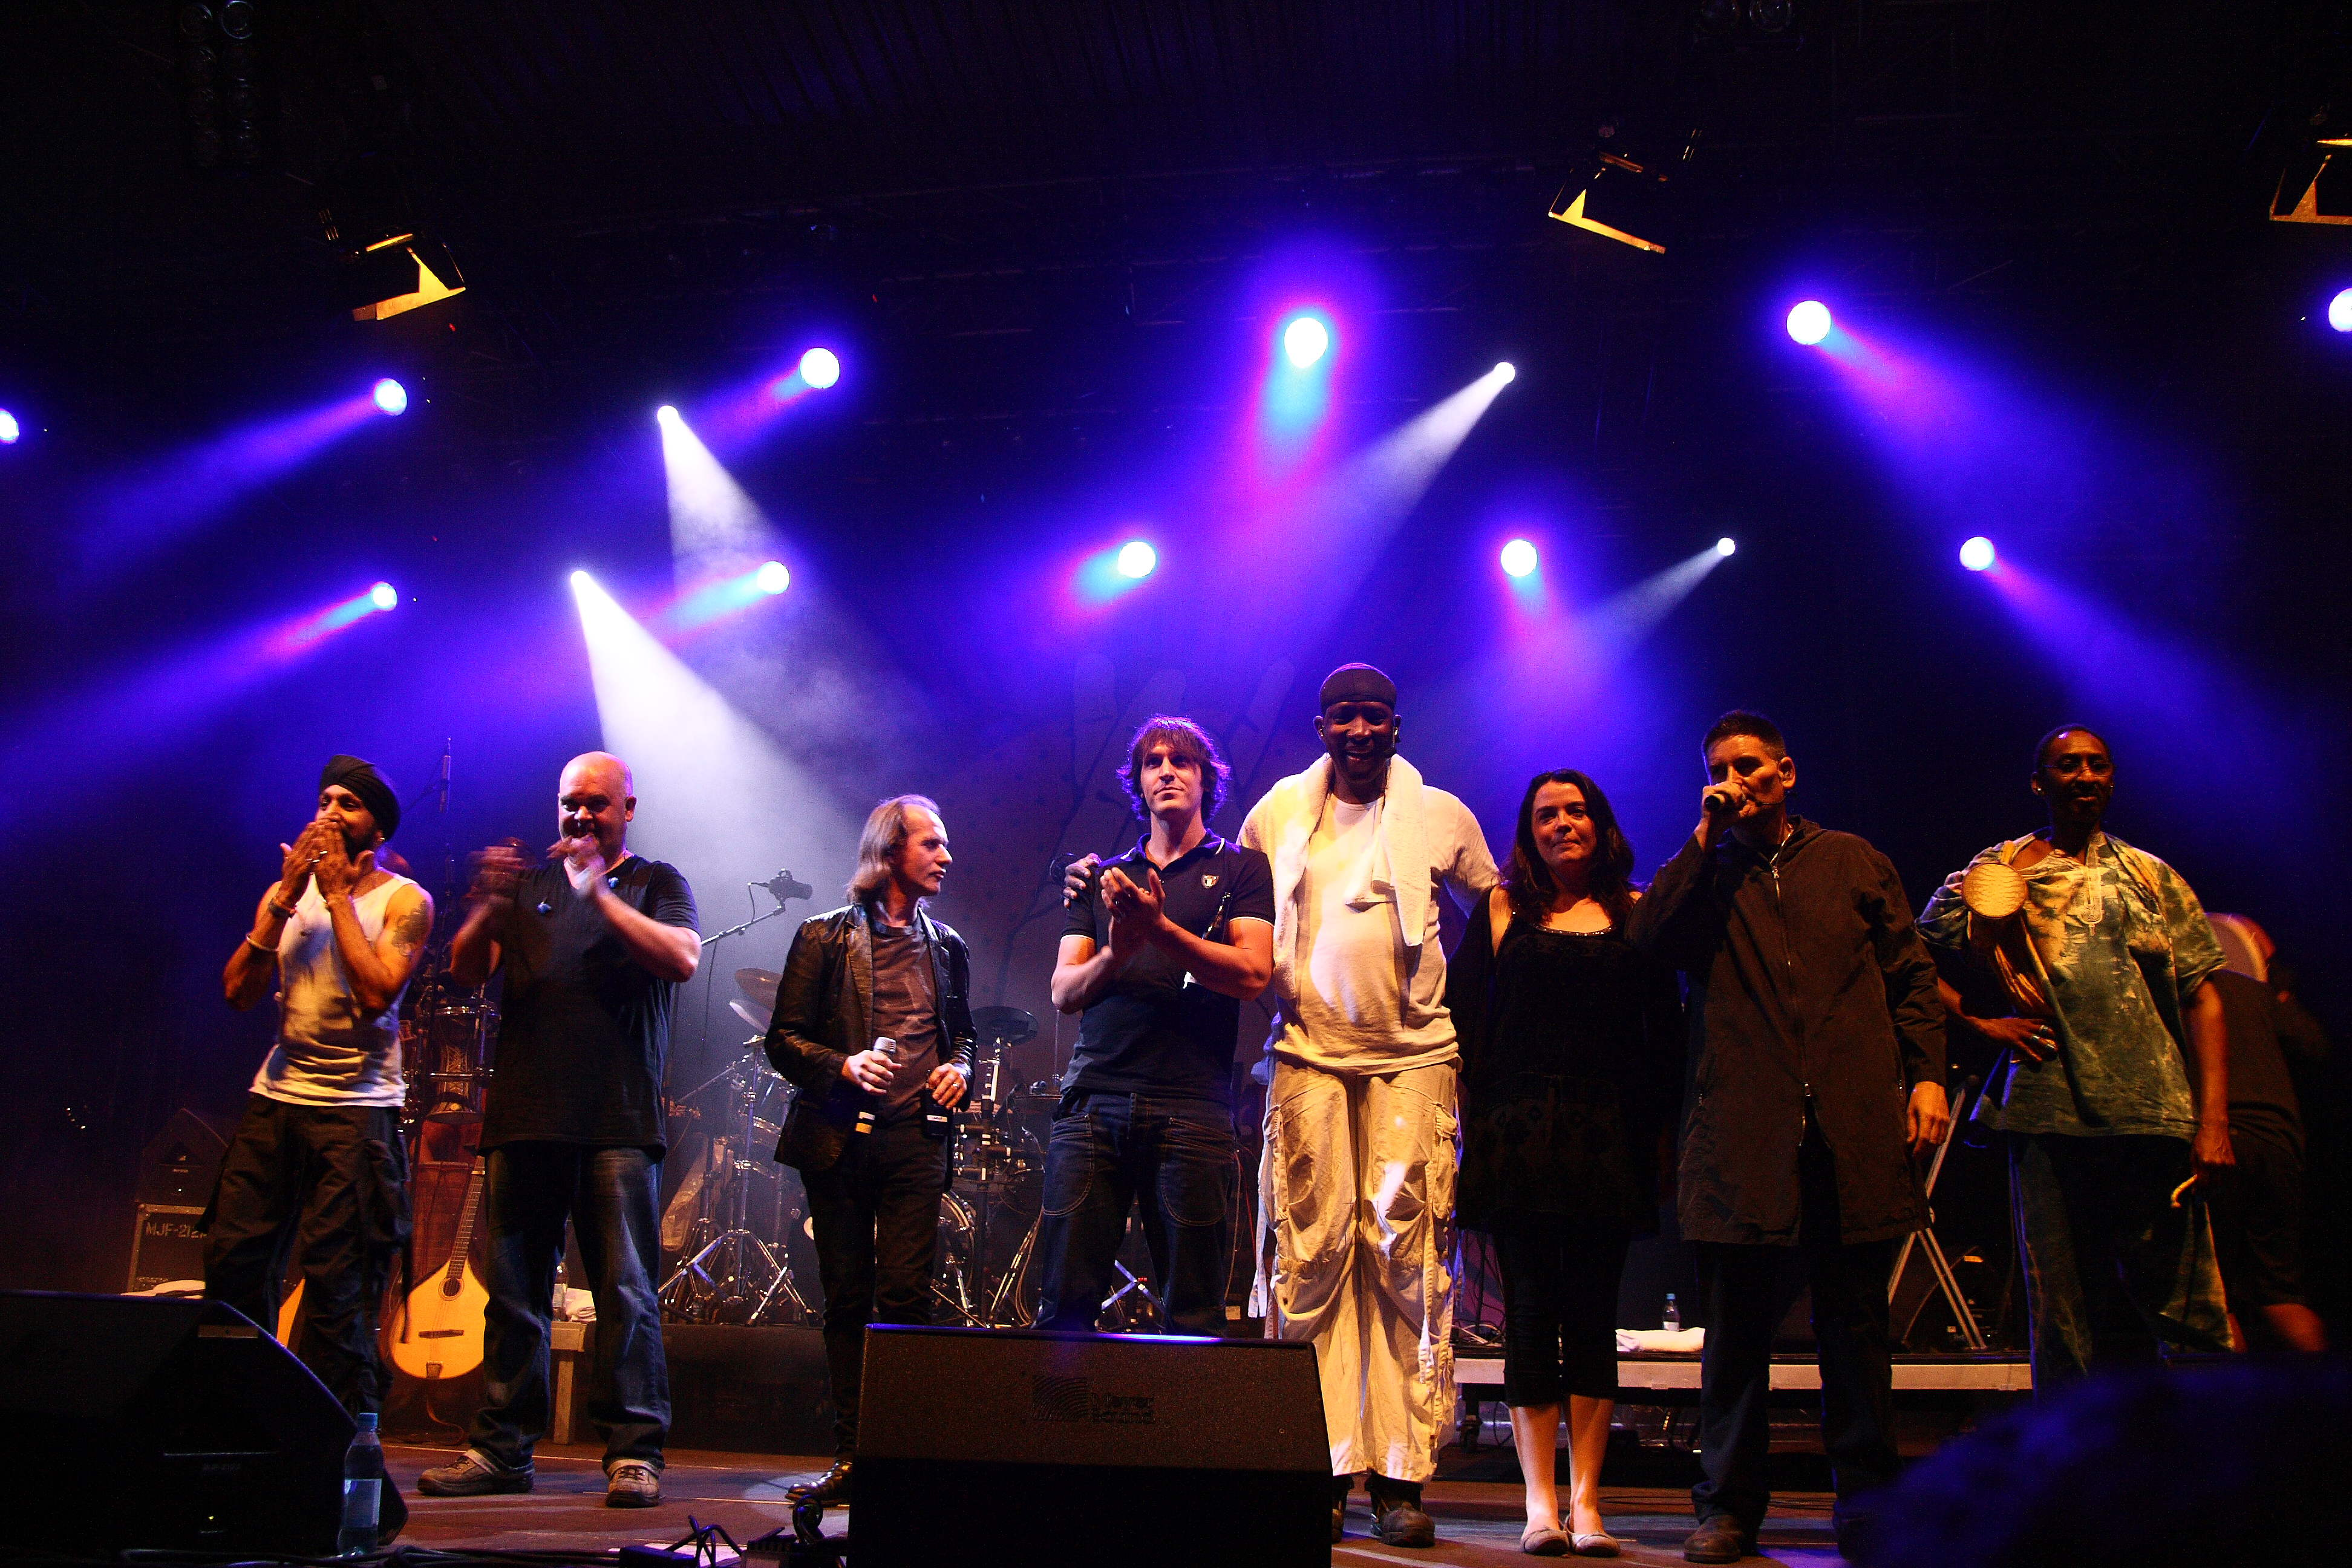 Afro Celt Soundsystem at TFF.Rudolstadt 2010. L.t.R: Johnny Kalsi, Simon Emmerson, Iarla Ó Lionáird, Ian Markin, N´Faly Kouyate, Emer Mayock, James McNally, Moussa Sissokho.